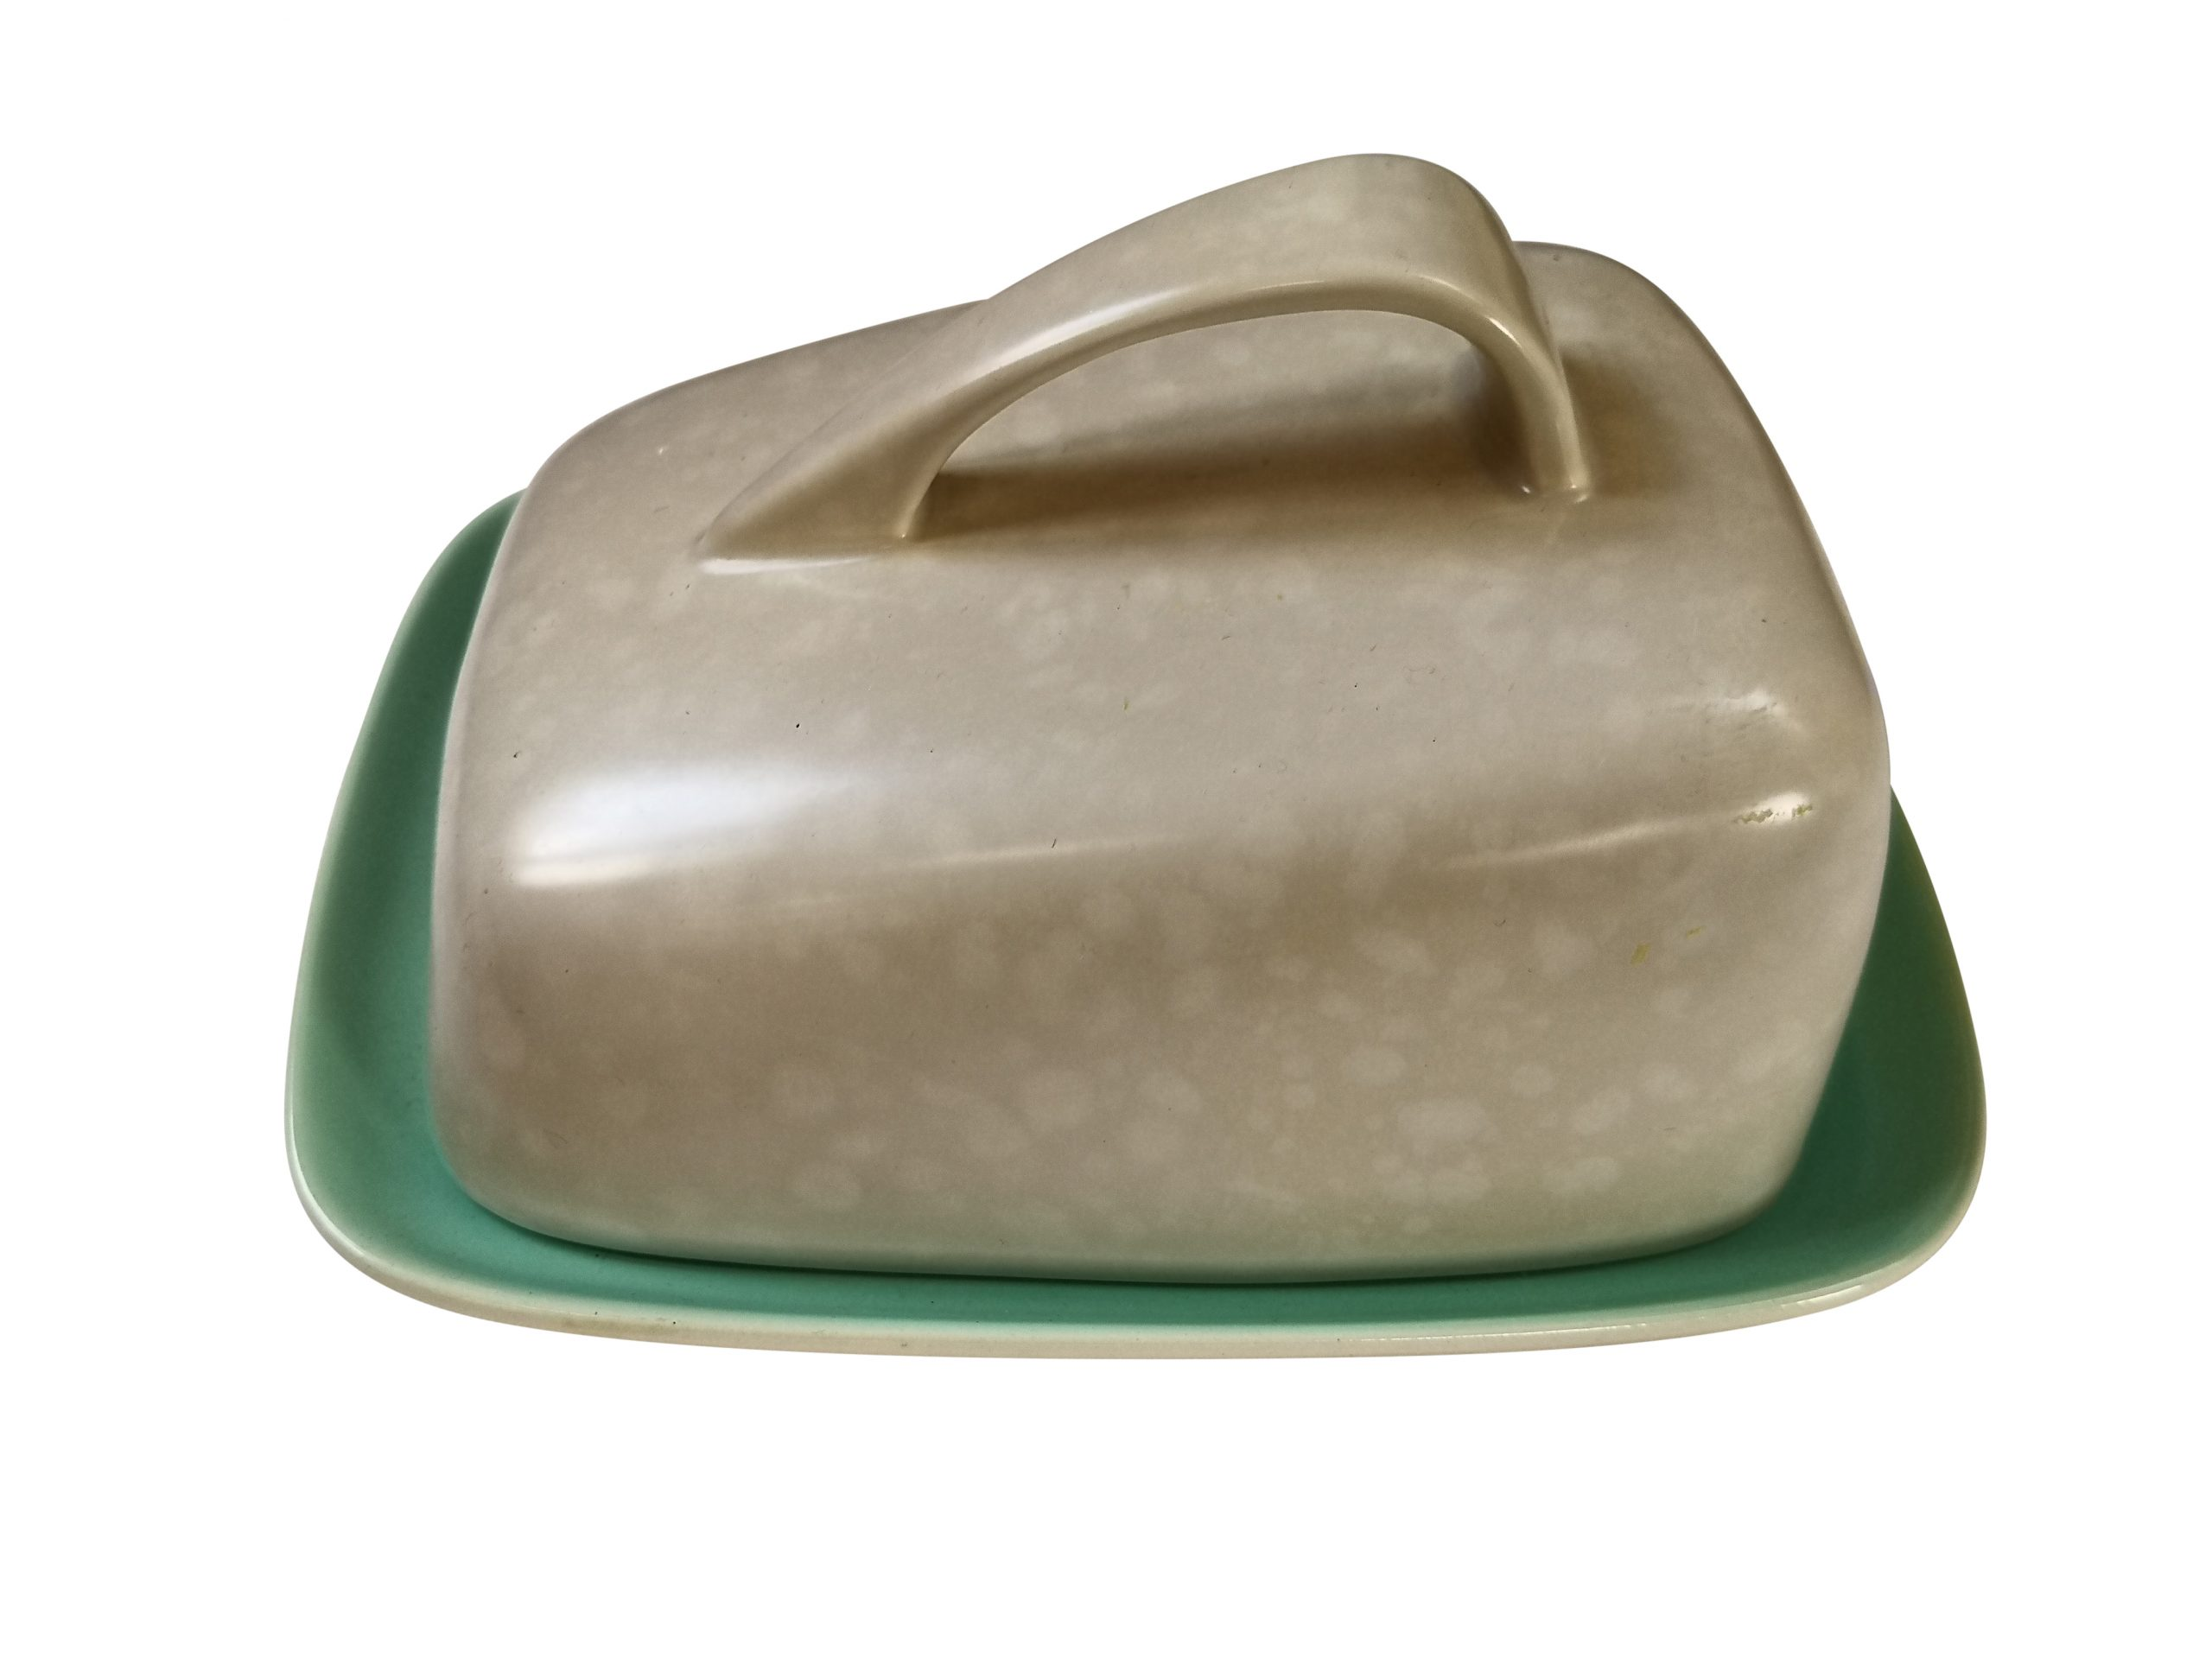 Poole pottery mid-century twin tone butter dish from Antik Seramika